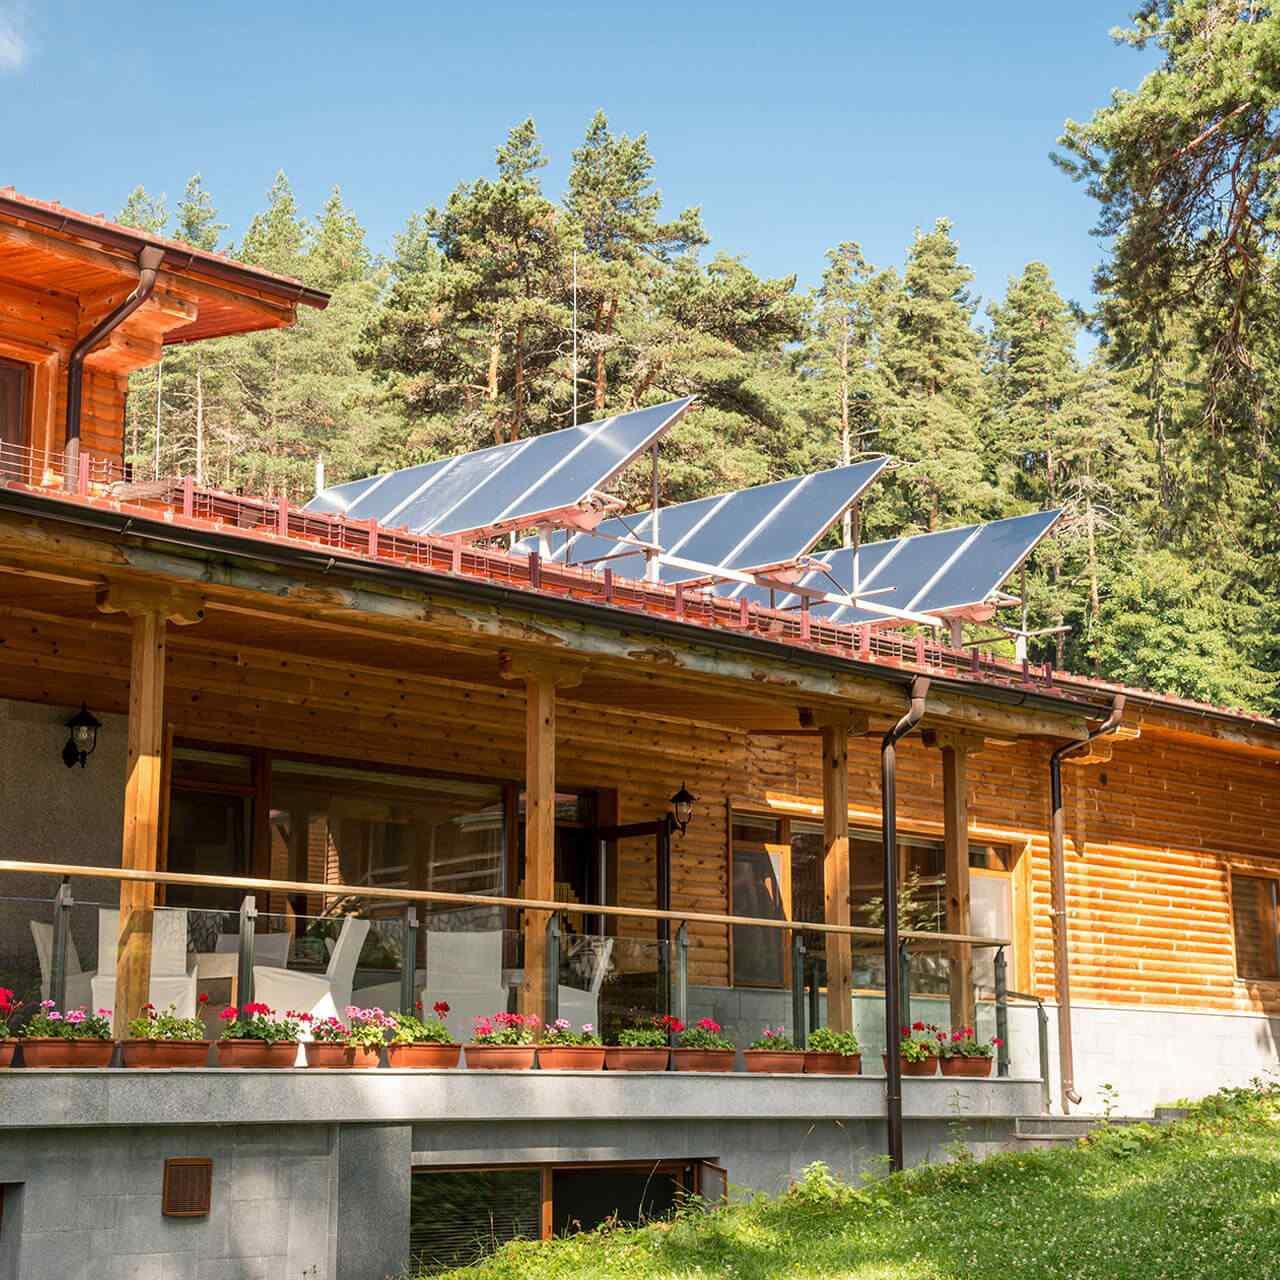 https://solarpanelorlando.com/wp-content/uploads/2018/09/gallery_projects_11-1280x1280.jpg